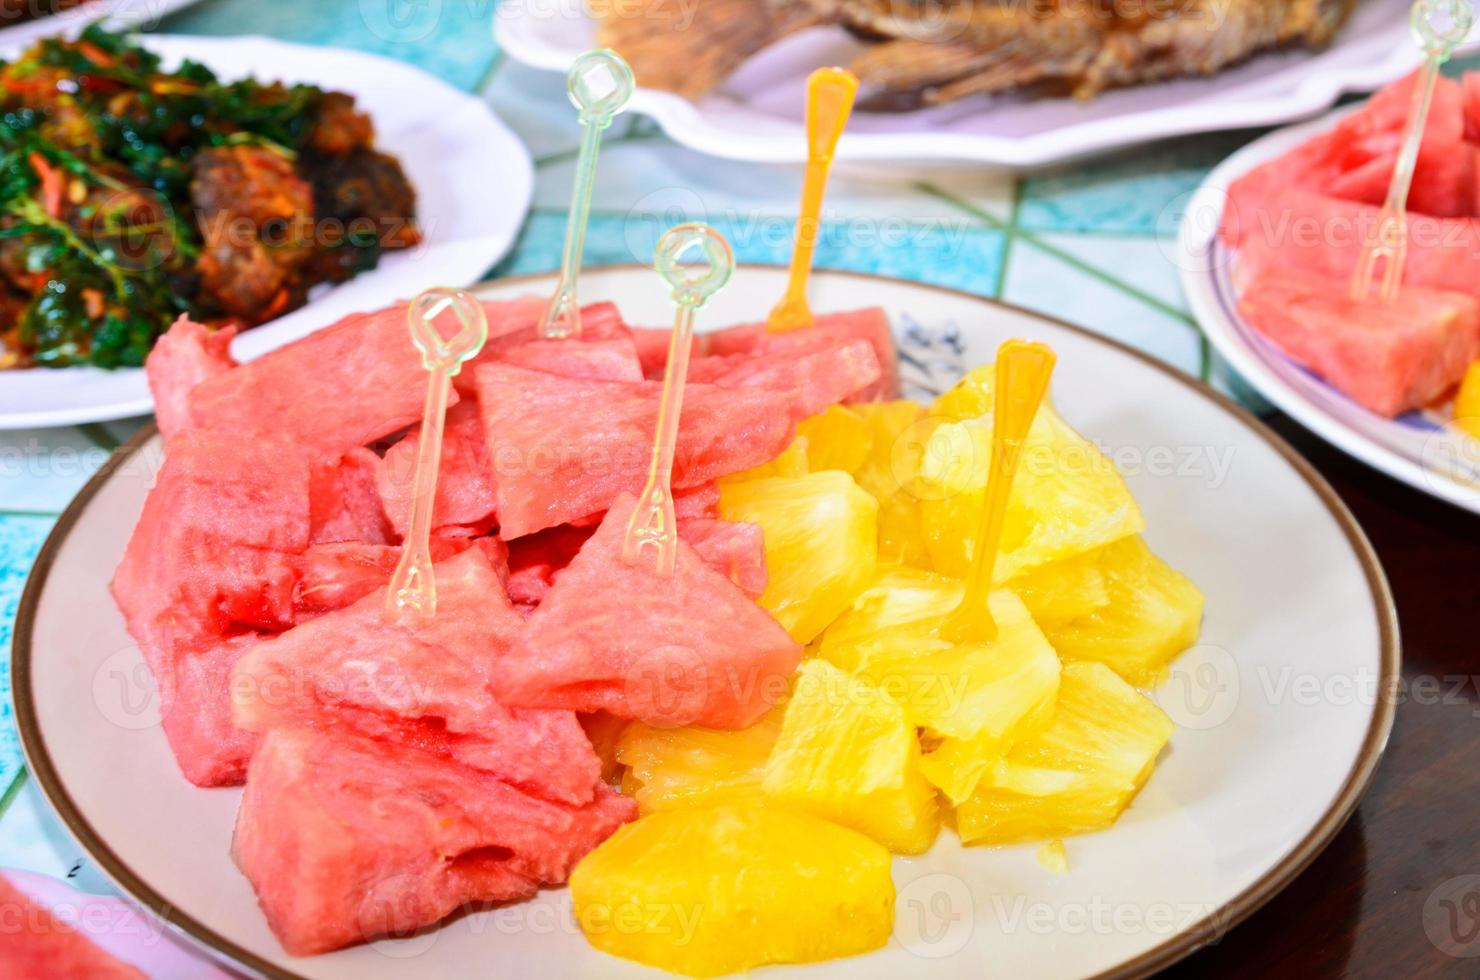 pineapple, watermelon on dish photo